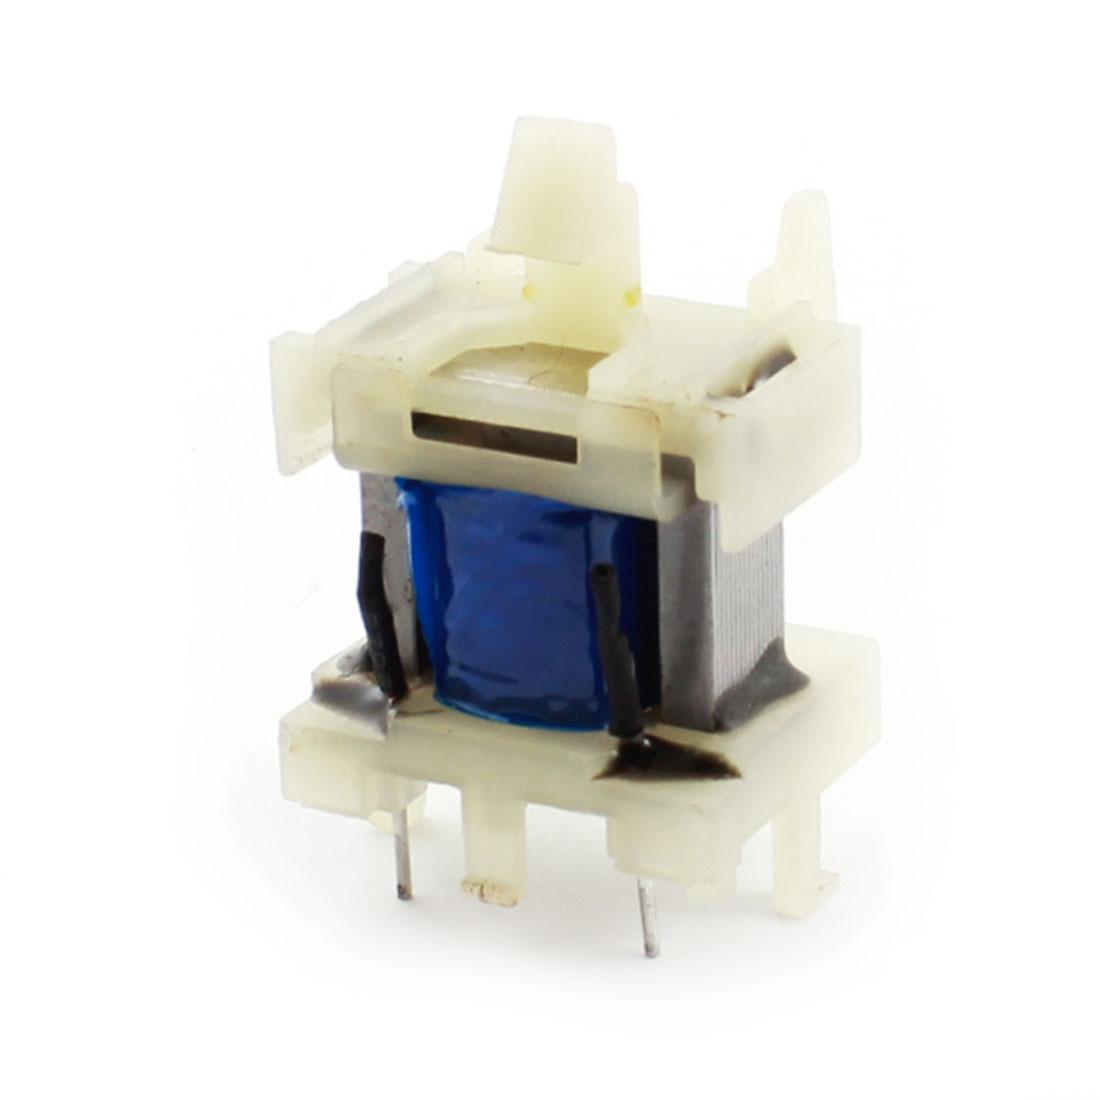 Spare Parts Mini Solenoid Electromagnet DC 12V 0mm 1200g